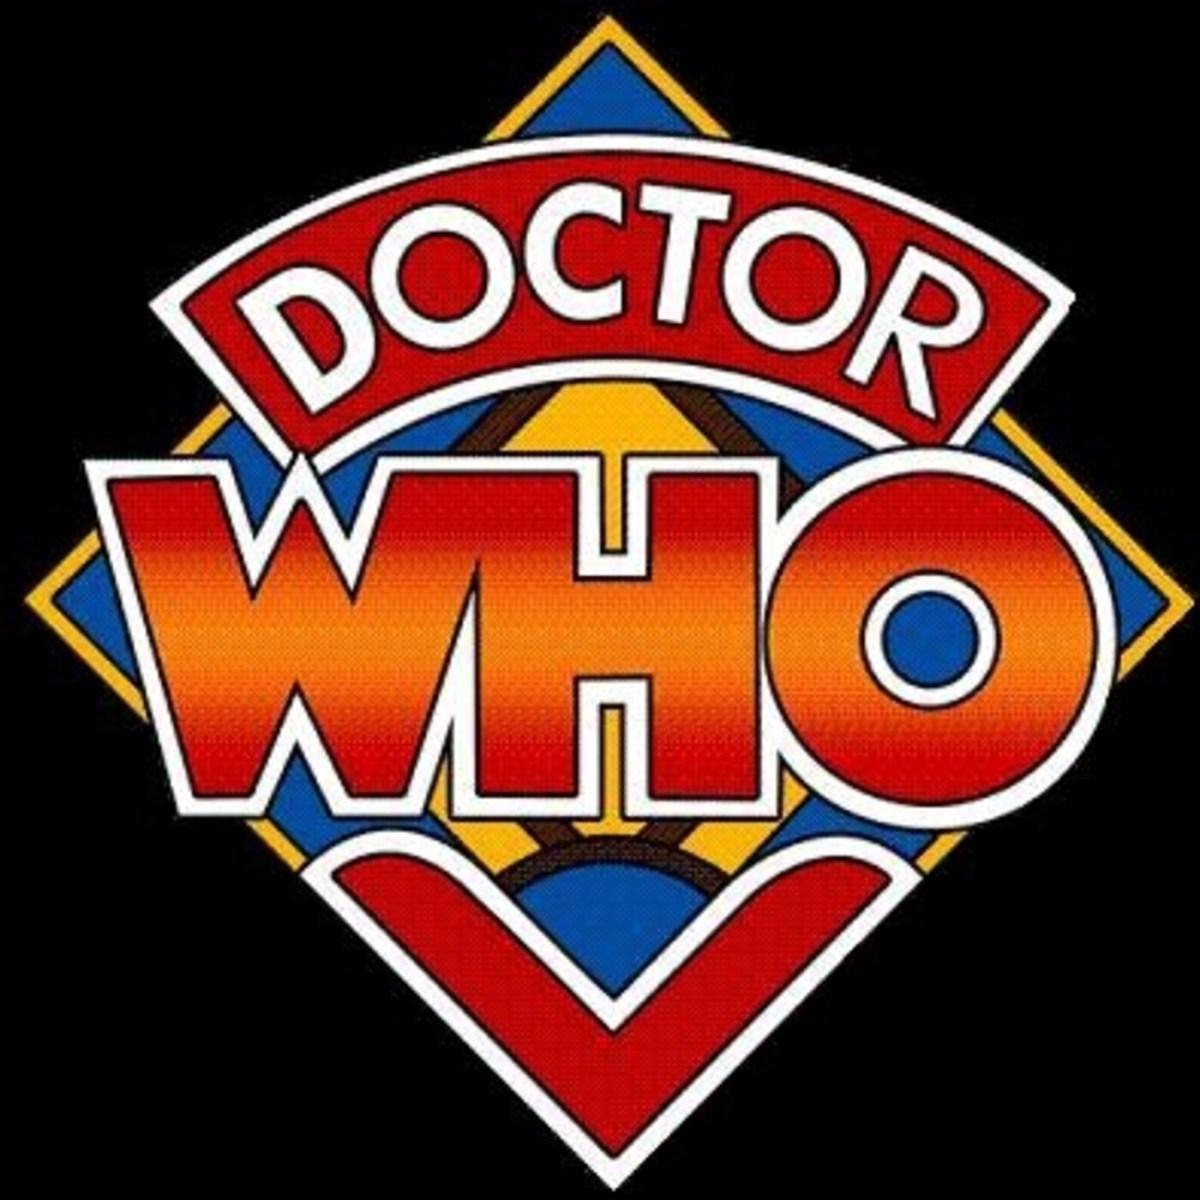 Kernelpanikk T6 12: Dr. Who. Parte 1: los doctores clásicos